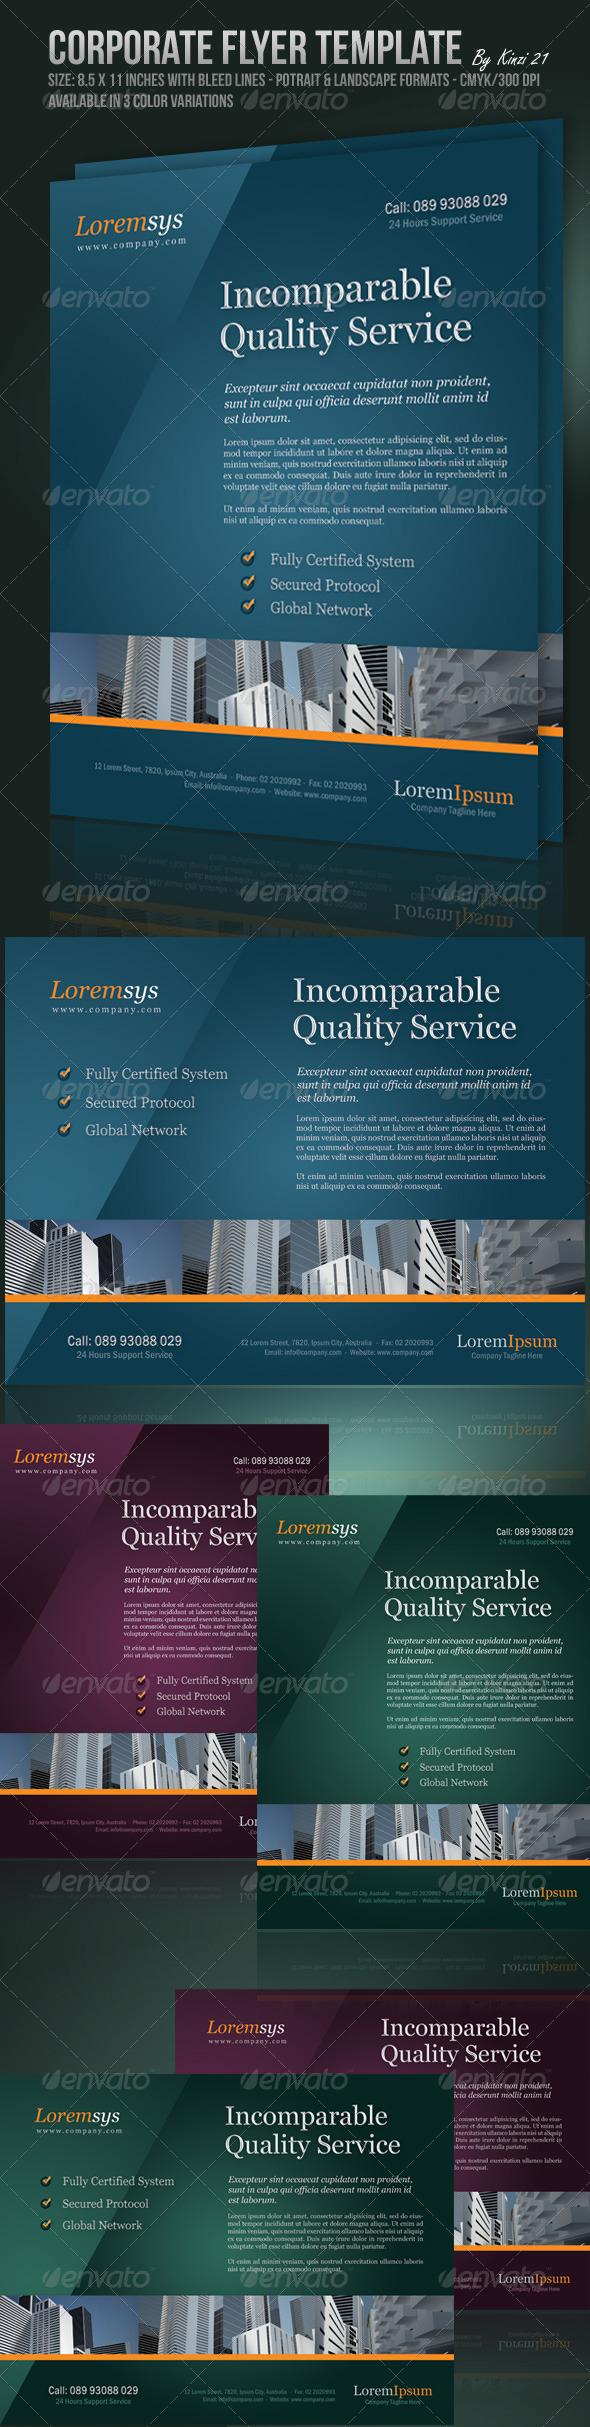 GraphicRiver Corporate Flyer Template 132496